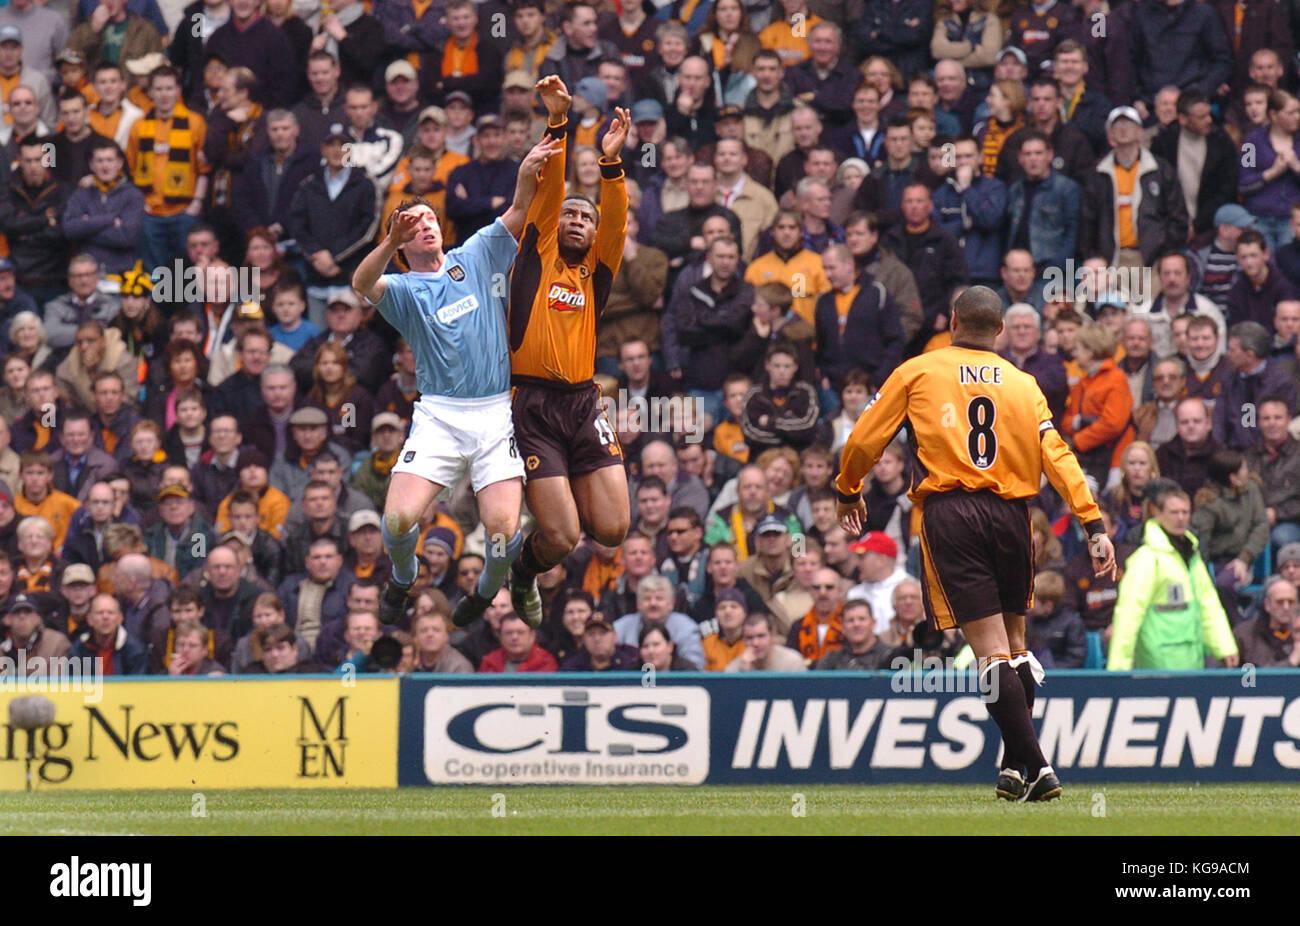 Footballer Robbie Fowler and Isaac Okoronkwo Manchester City v Wolverhampton Wanderers 10 April 2004 - Stock Image